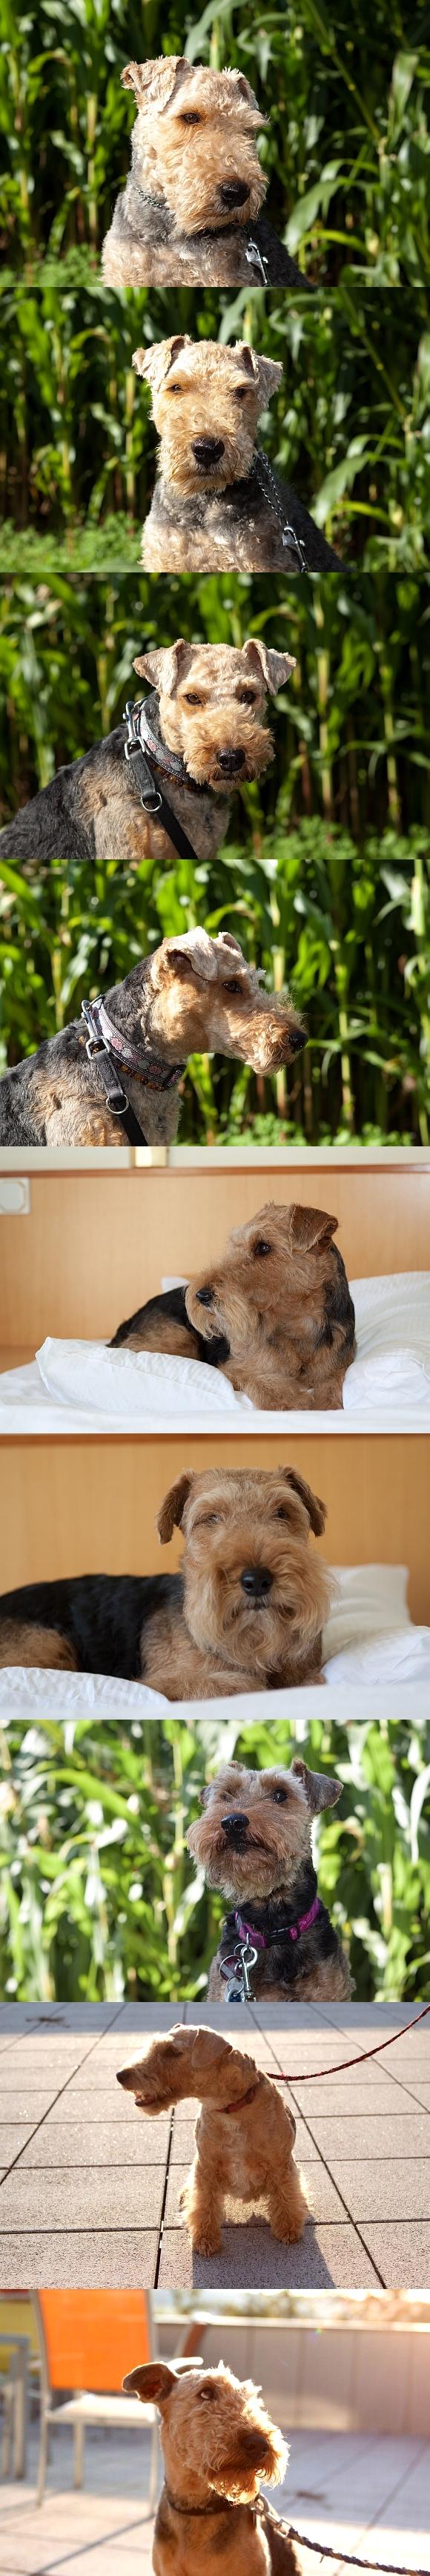 http://www.welsh-terrier-online.de/forum/bildupload/wtt_portrait.jpg